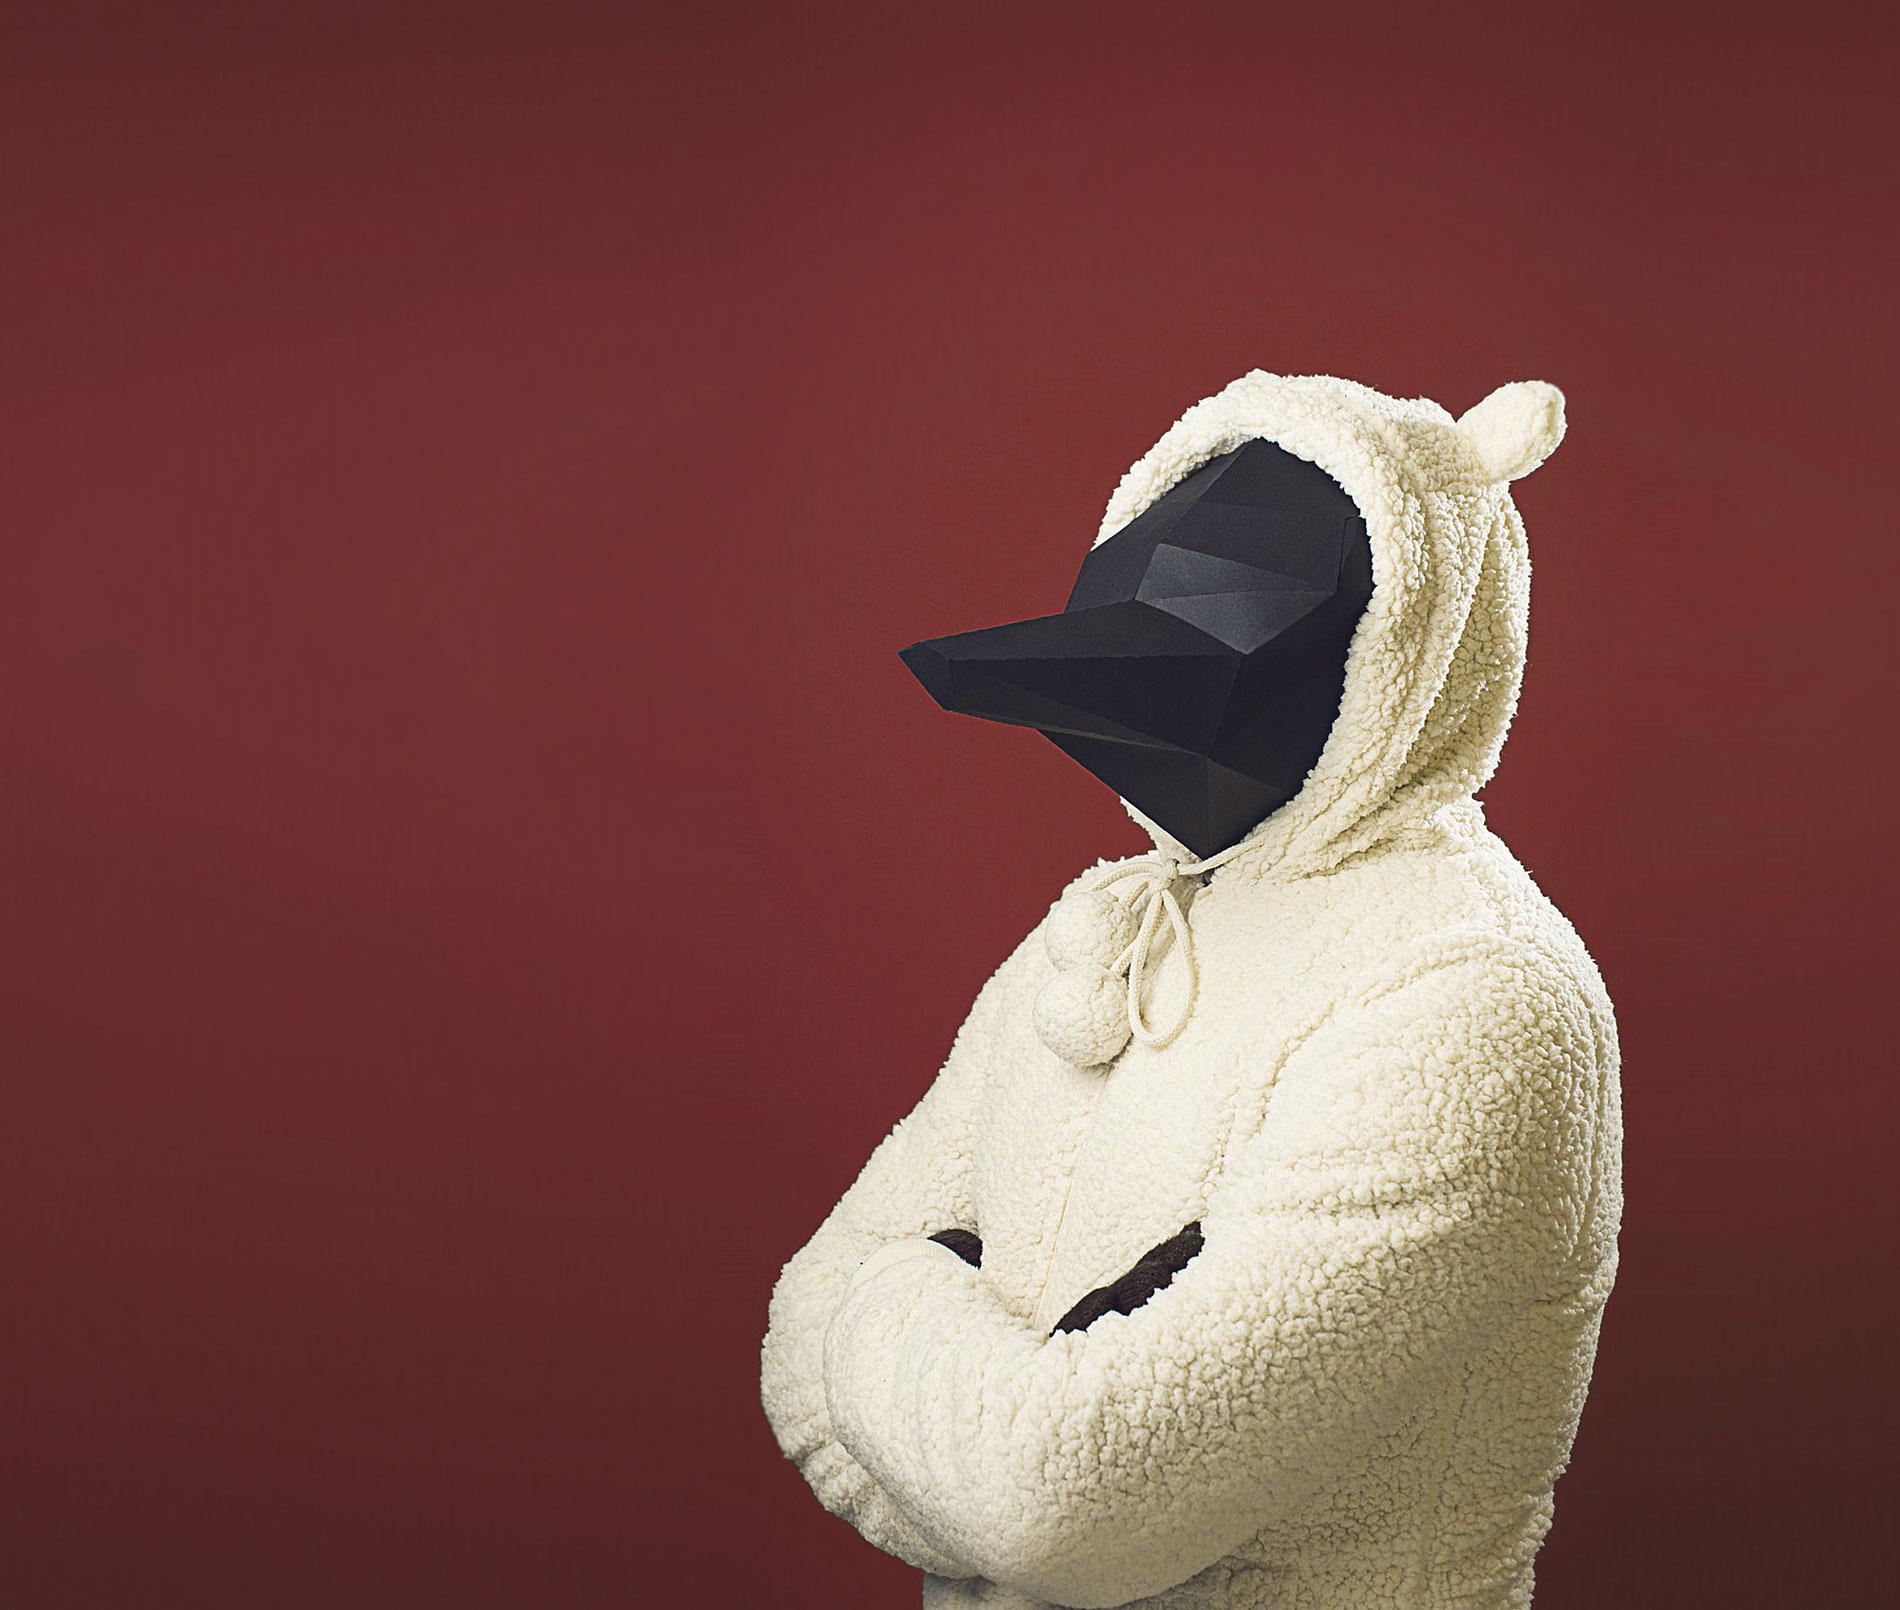 wolf-sheep-clothing